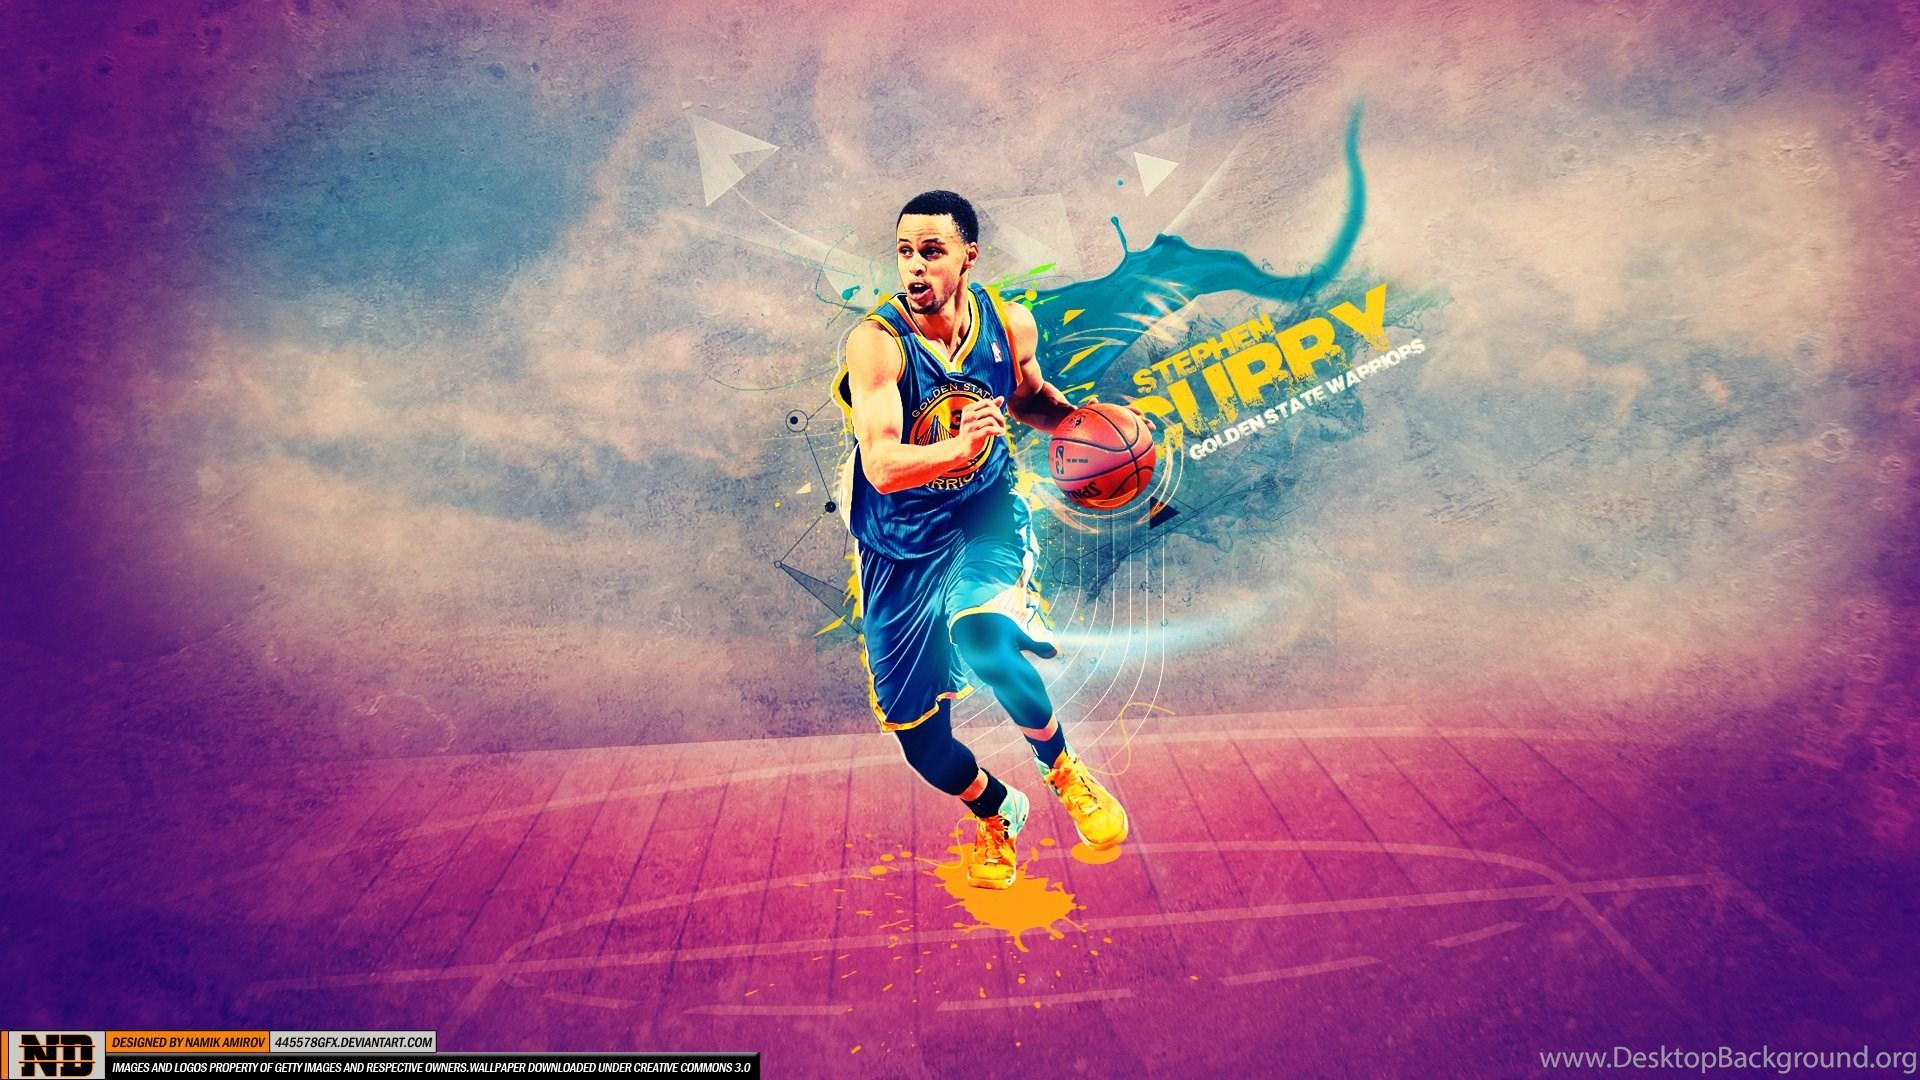 Stephen Curry Golden State Warriors Backgrounds Desktop Background